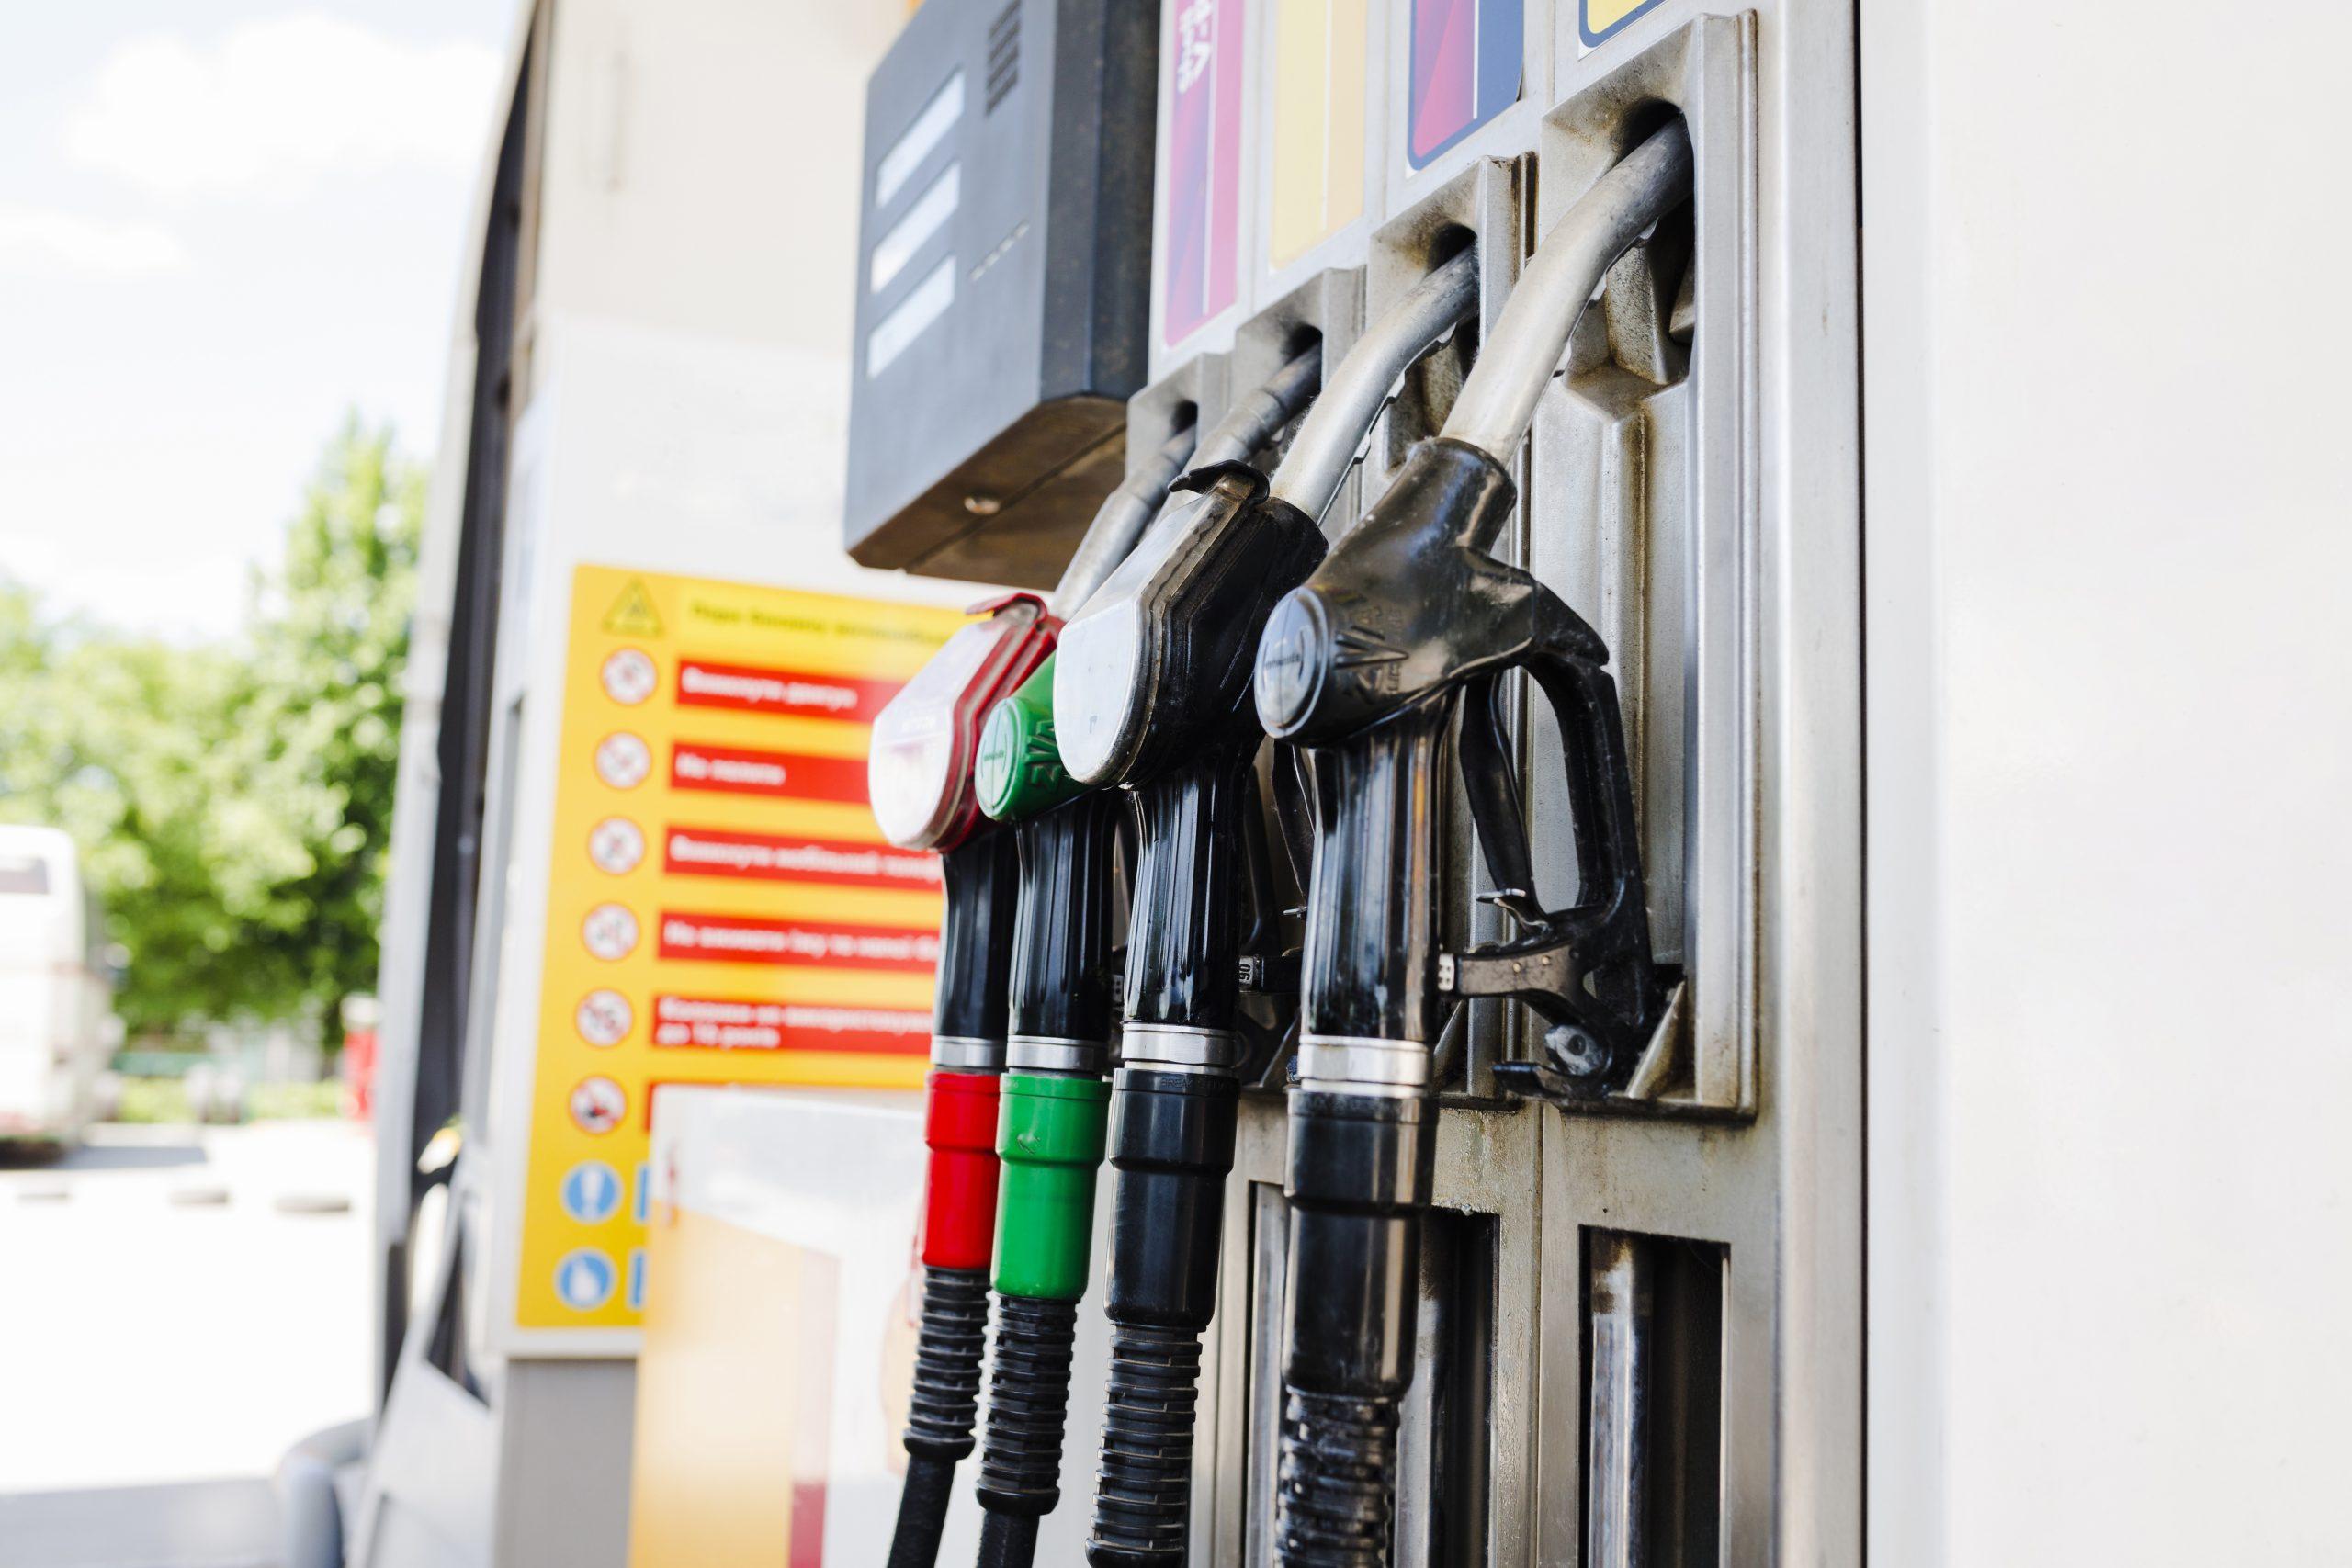 bomba de gasolina no posto de gasolina